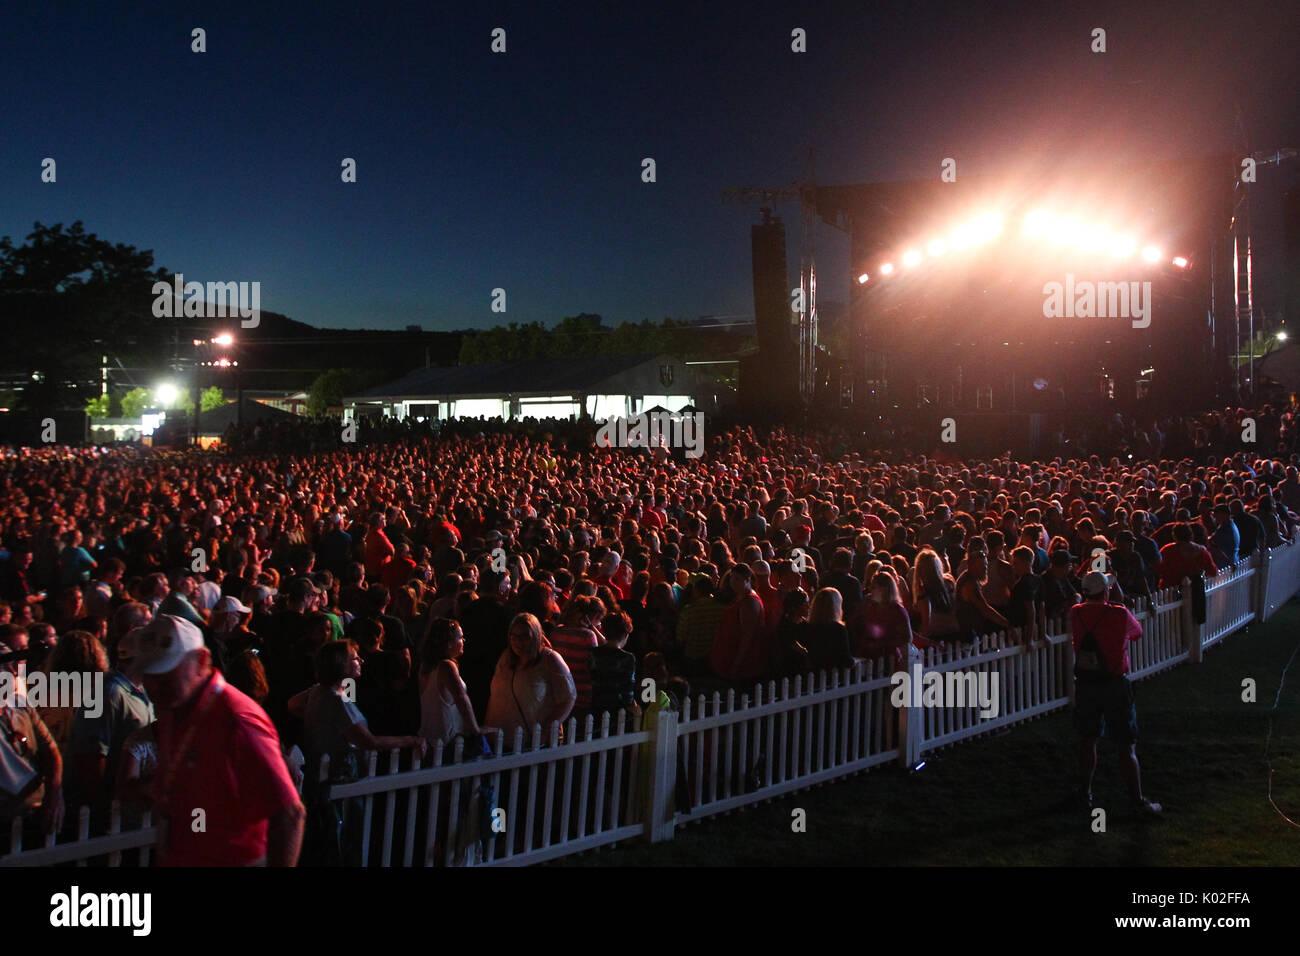 ENDICOTT, NY-AUG 18: Singer Jon Bon Jovi performs at En ...